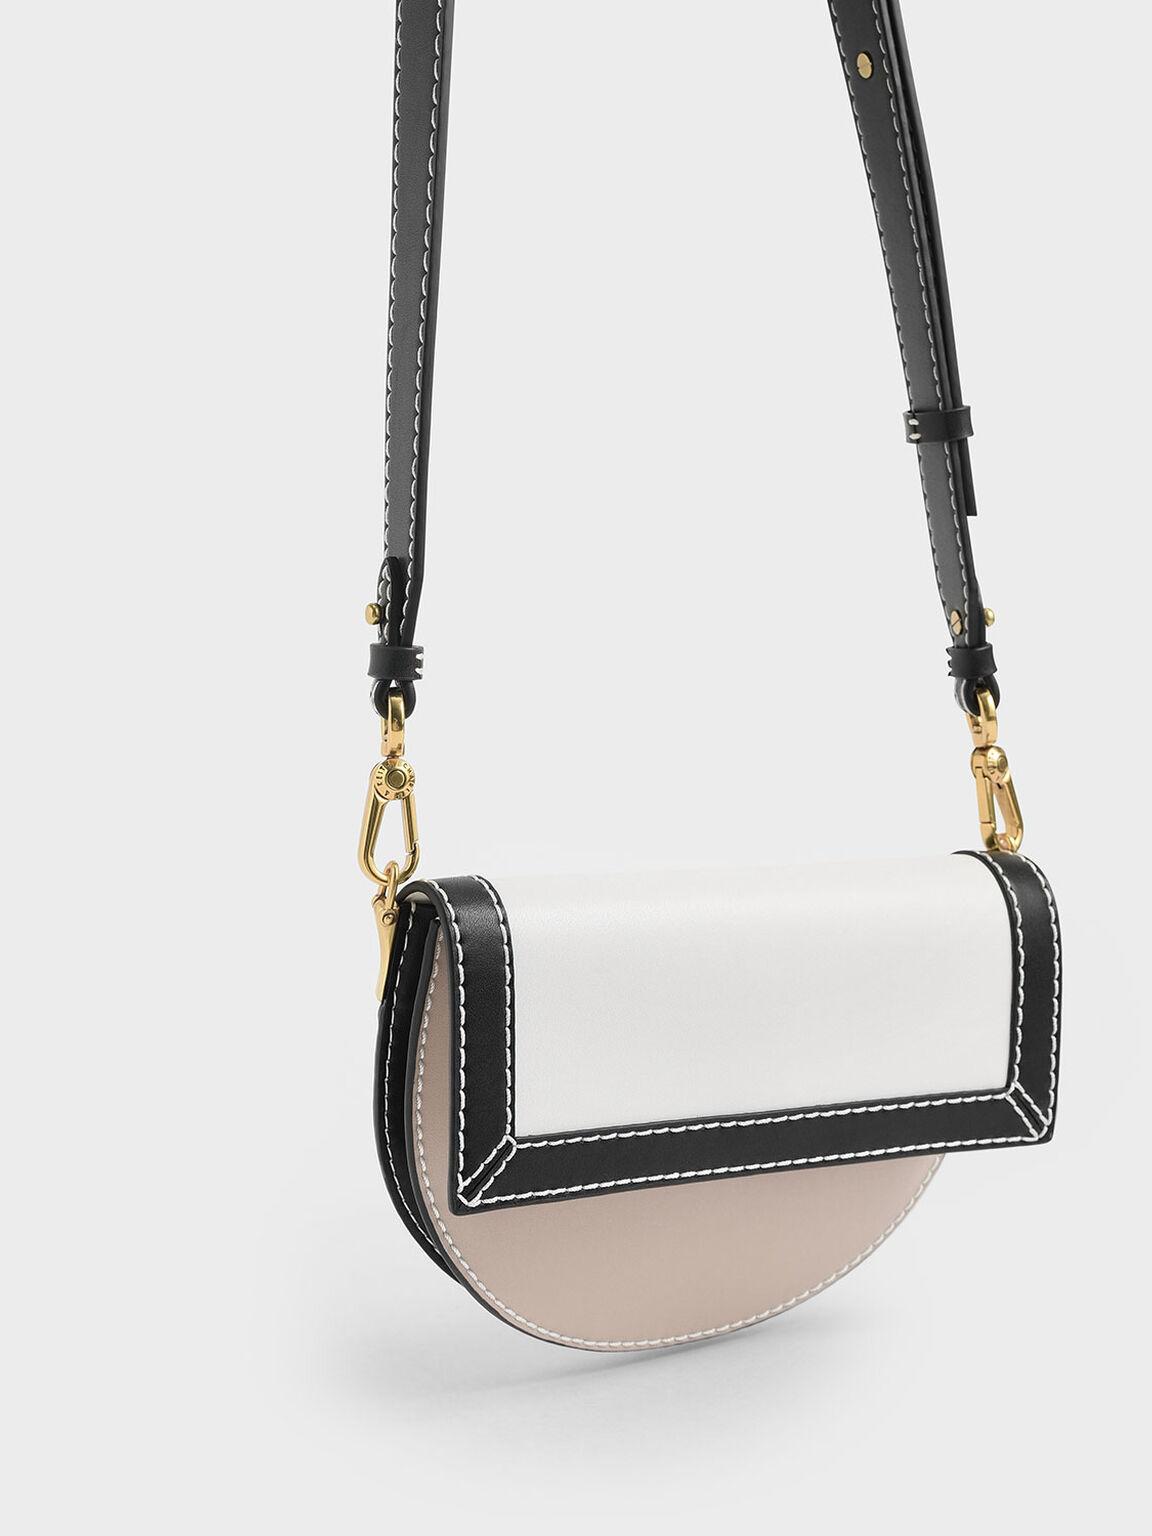 Two-Tone Front Flap Semi-Circle Crossbody Bag, Multi, hi-res